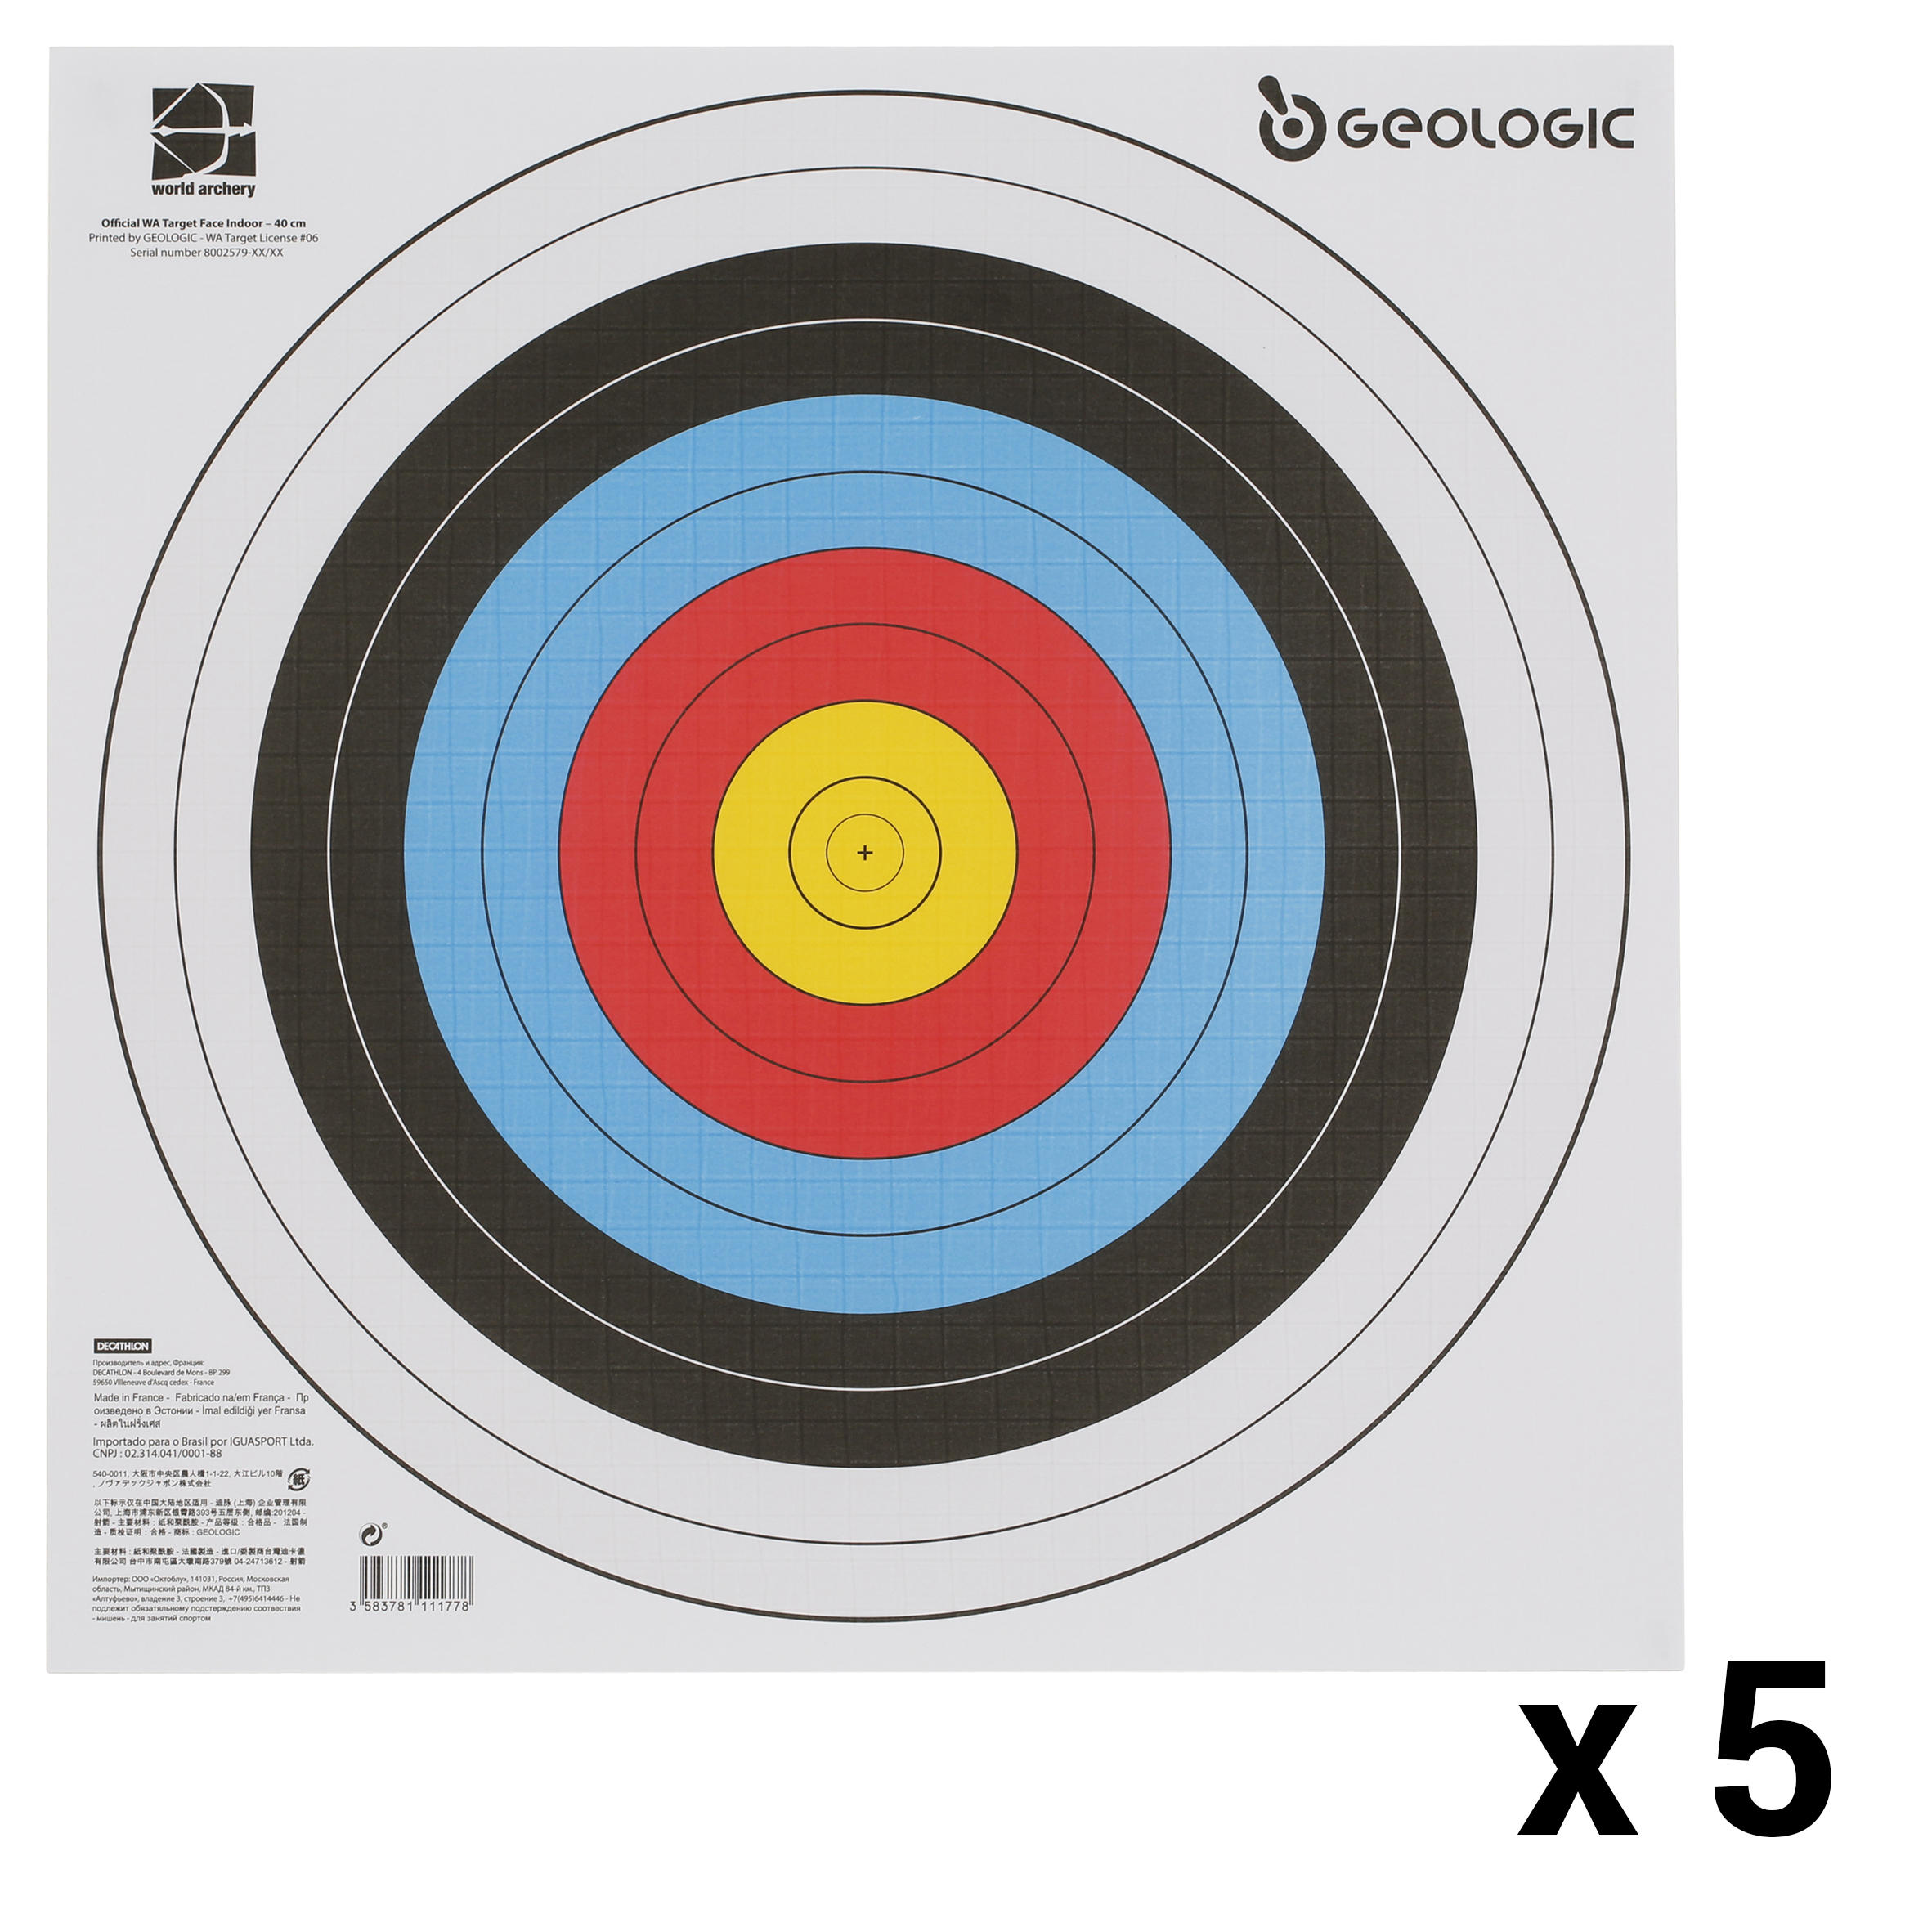 5 Ținte tir cu arcul 40x40 cm imagine